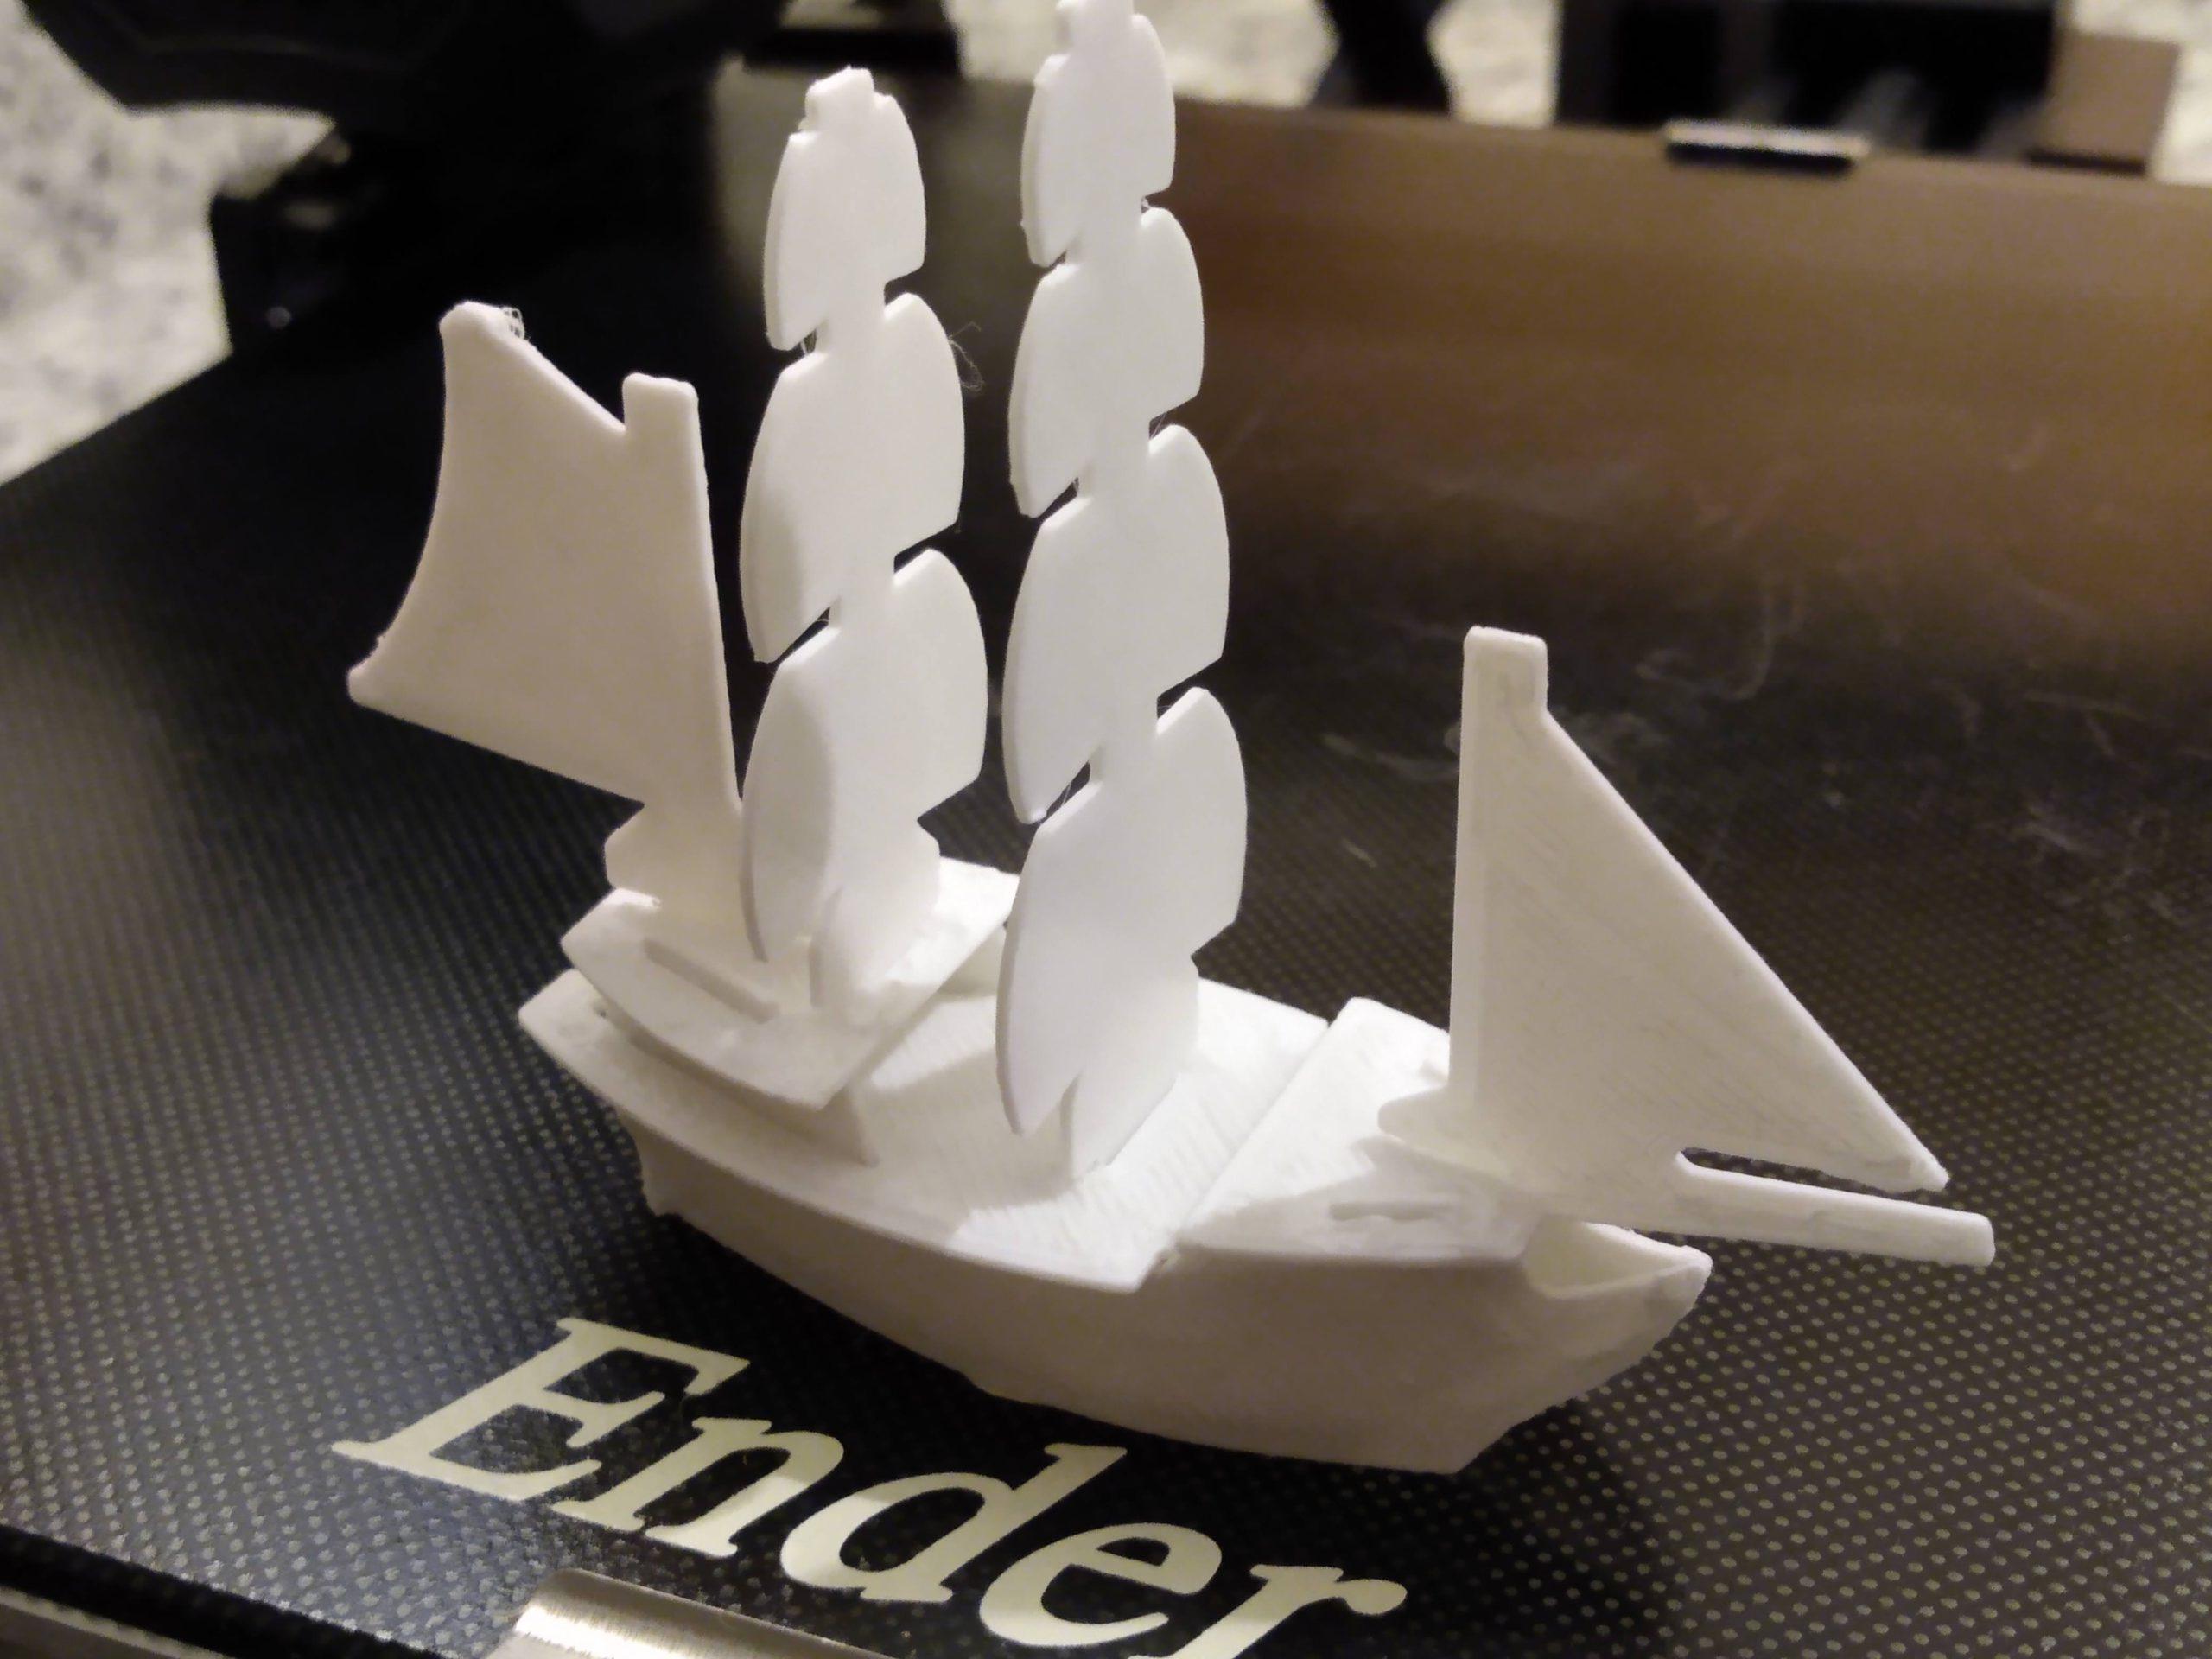 Ben's first 3D printed ship